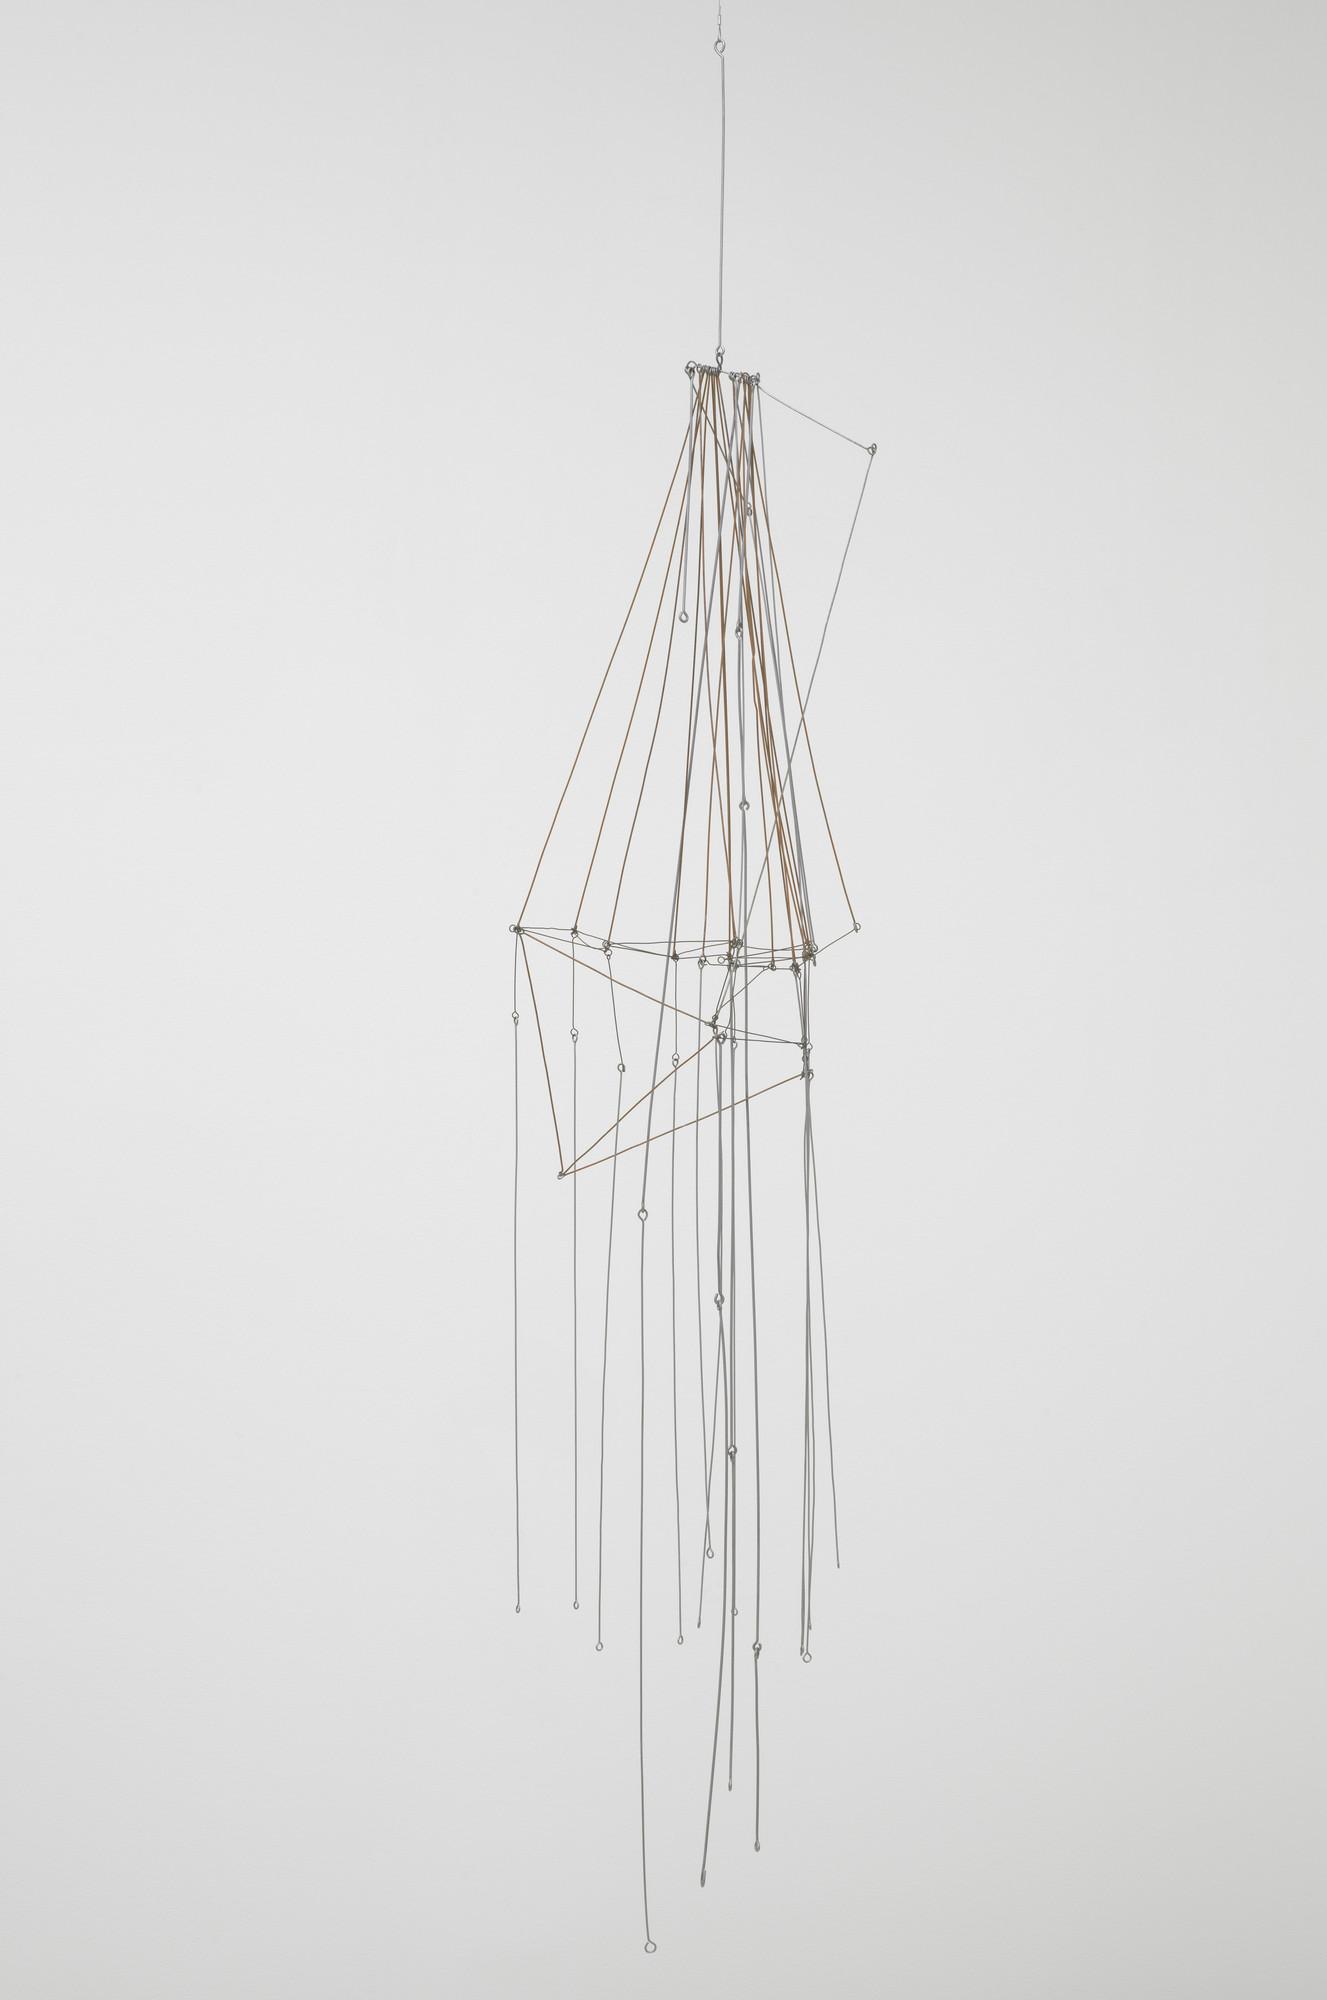 Gego. Chorro, no. 7. 1971. MoMA